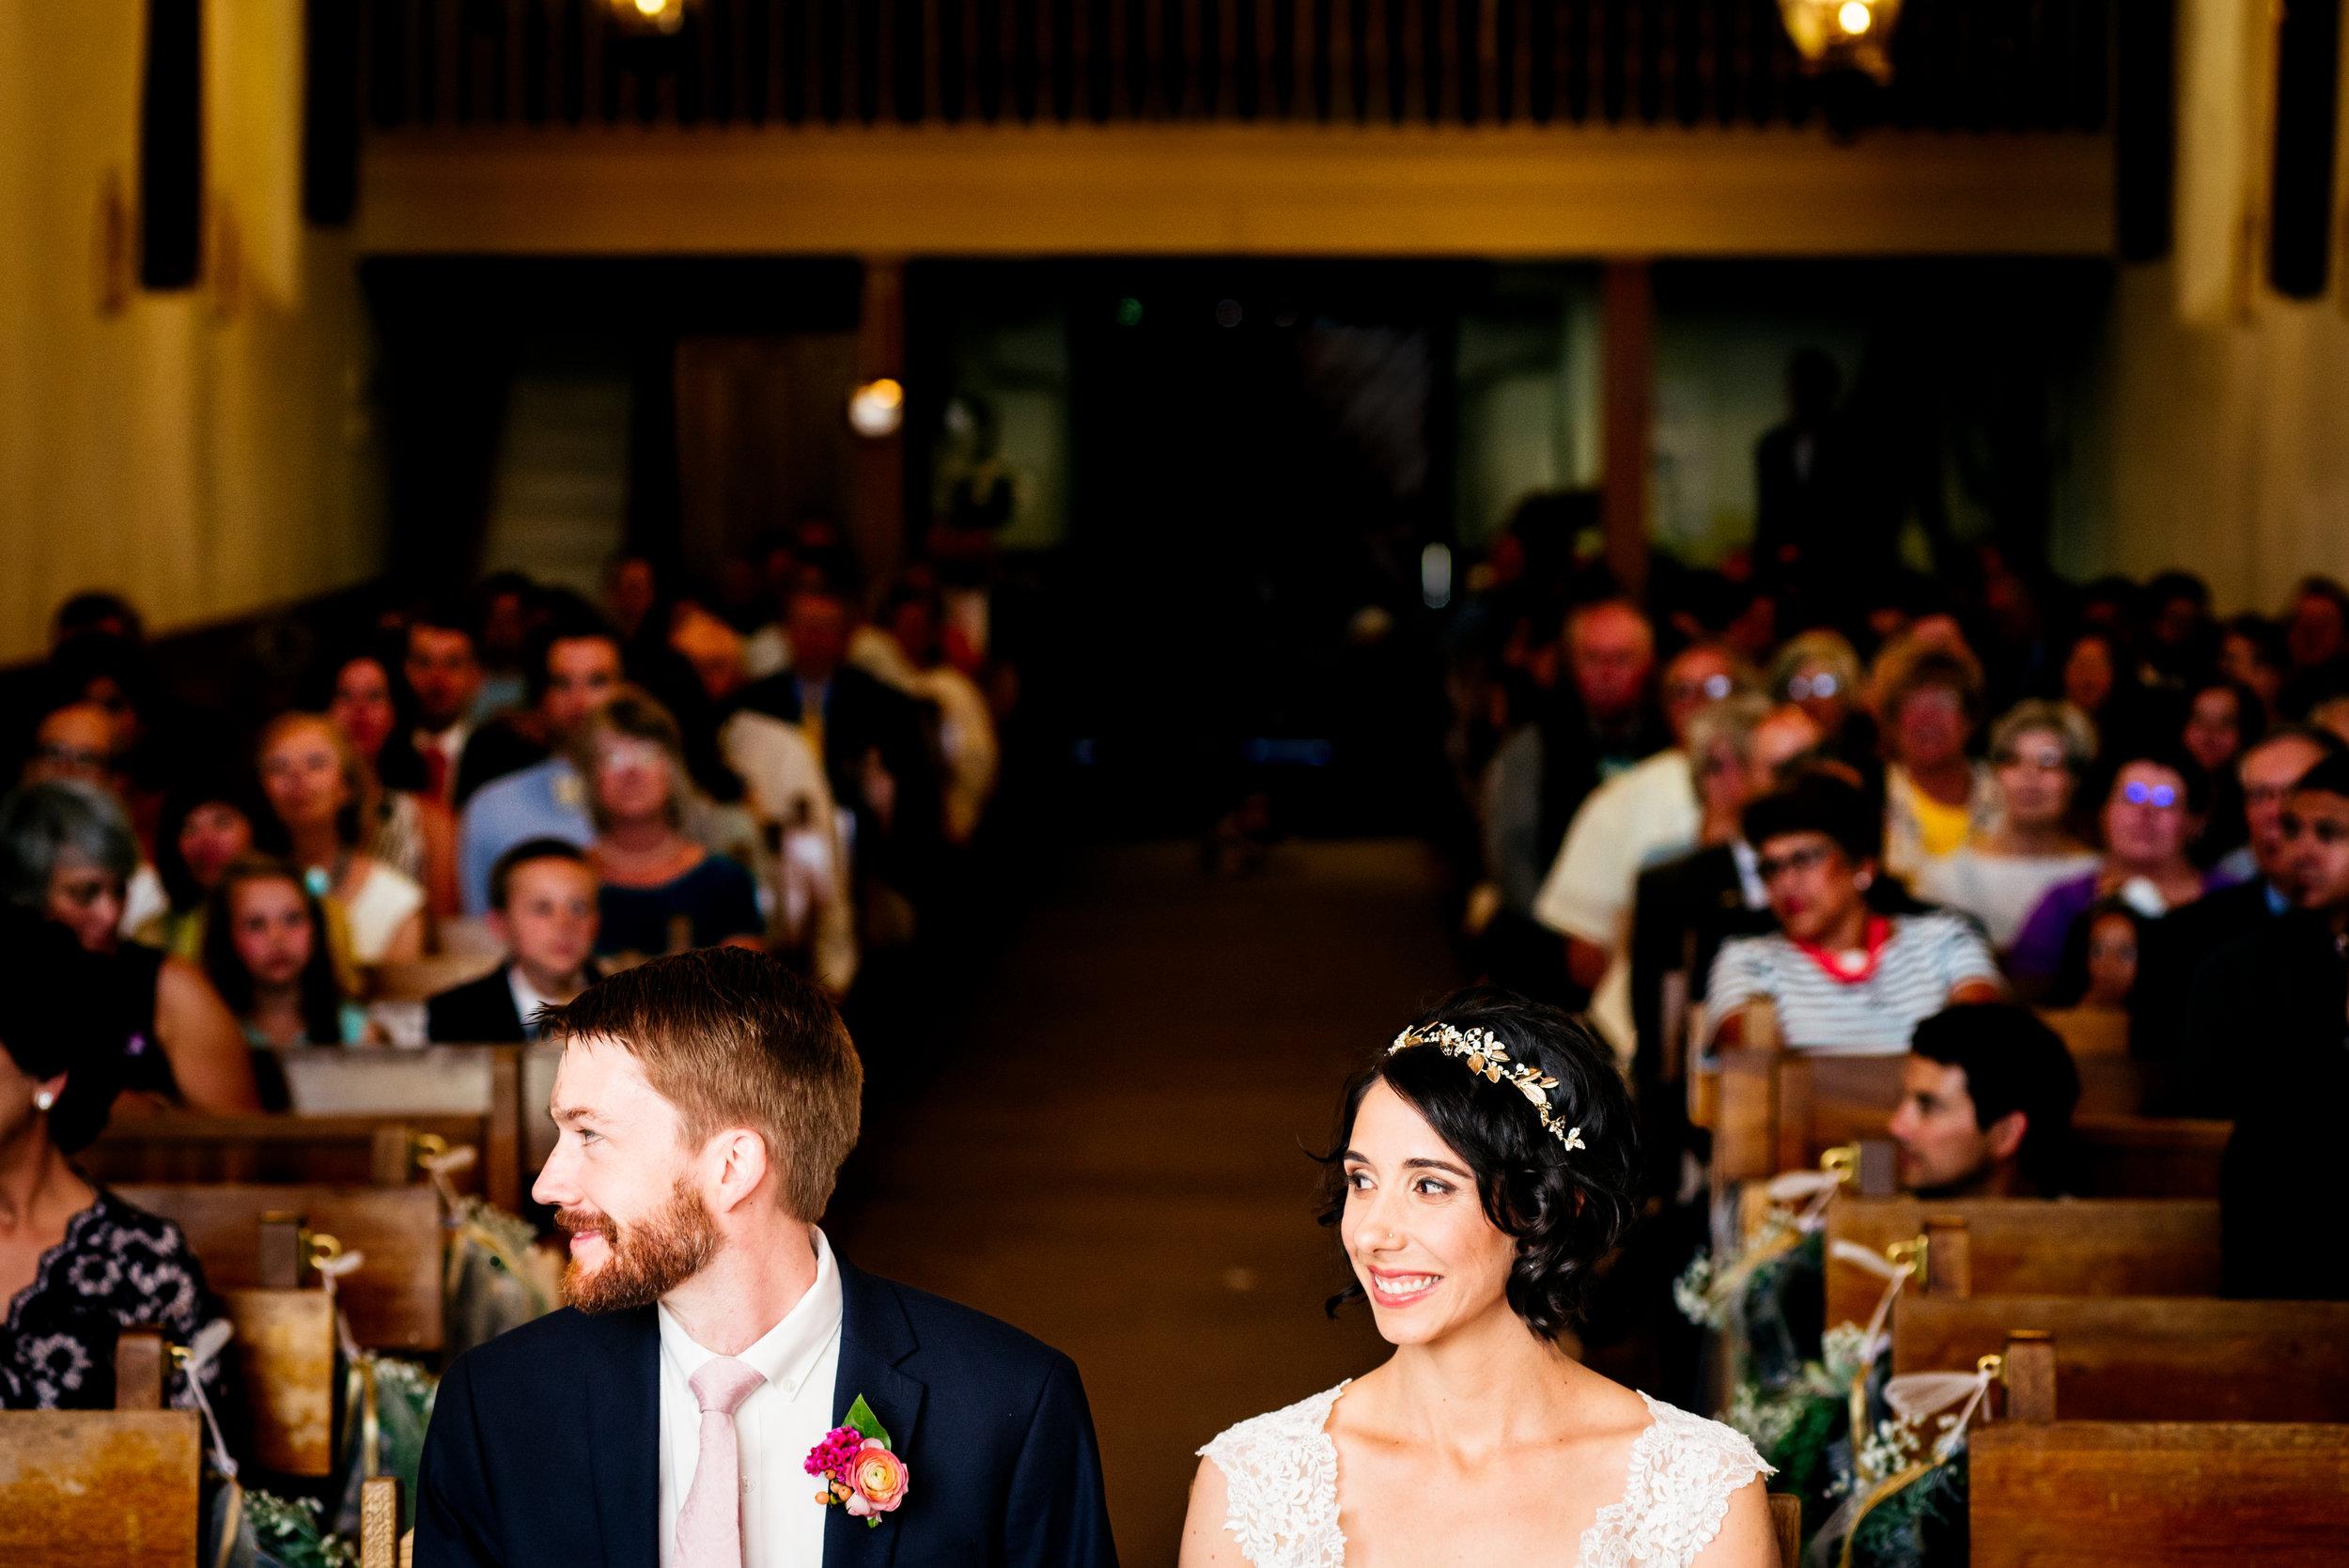 Extended_Play_Photography_Carmella_Wedding-9.jpg